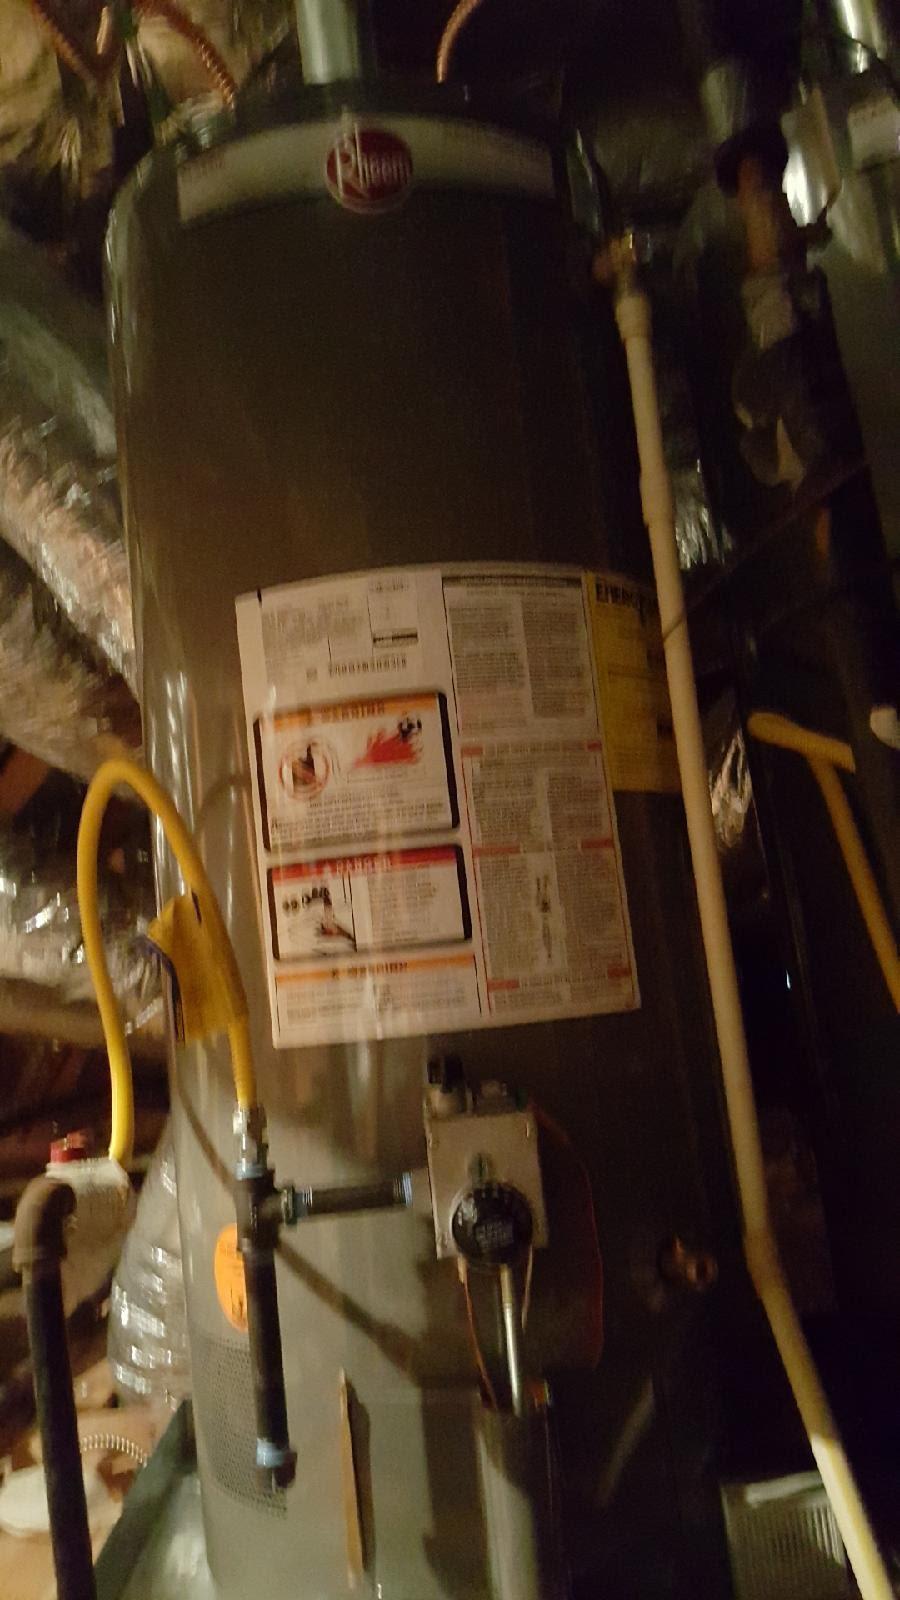 Katy Water Heaters image 51